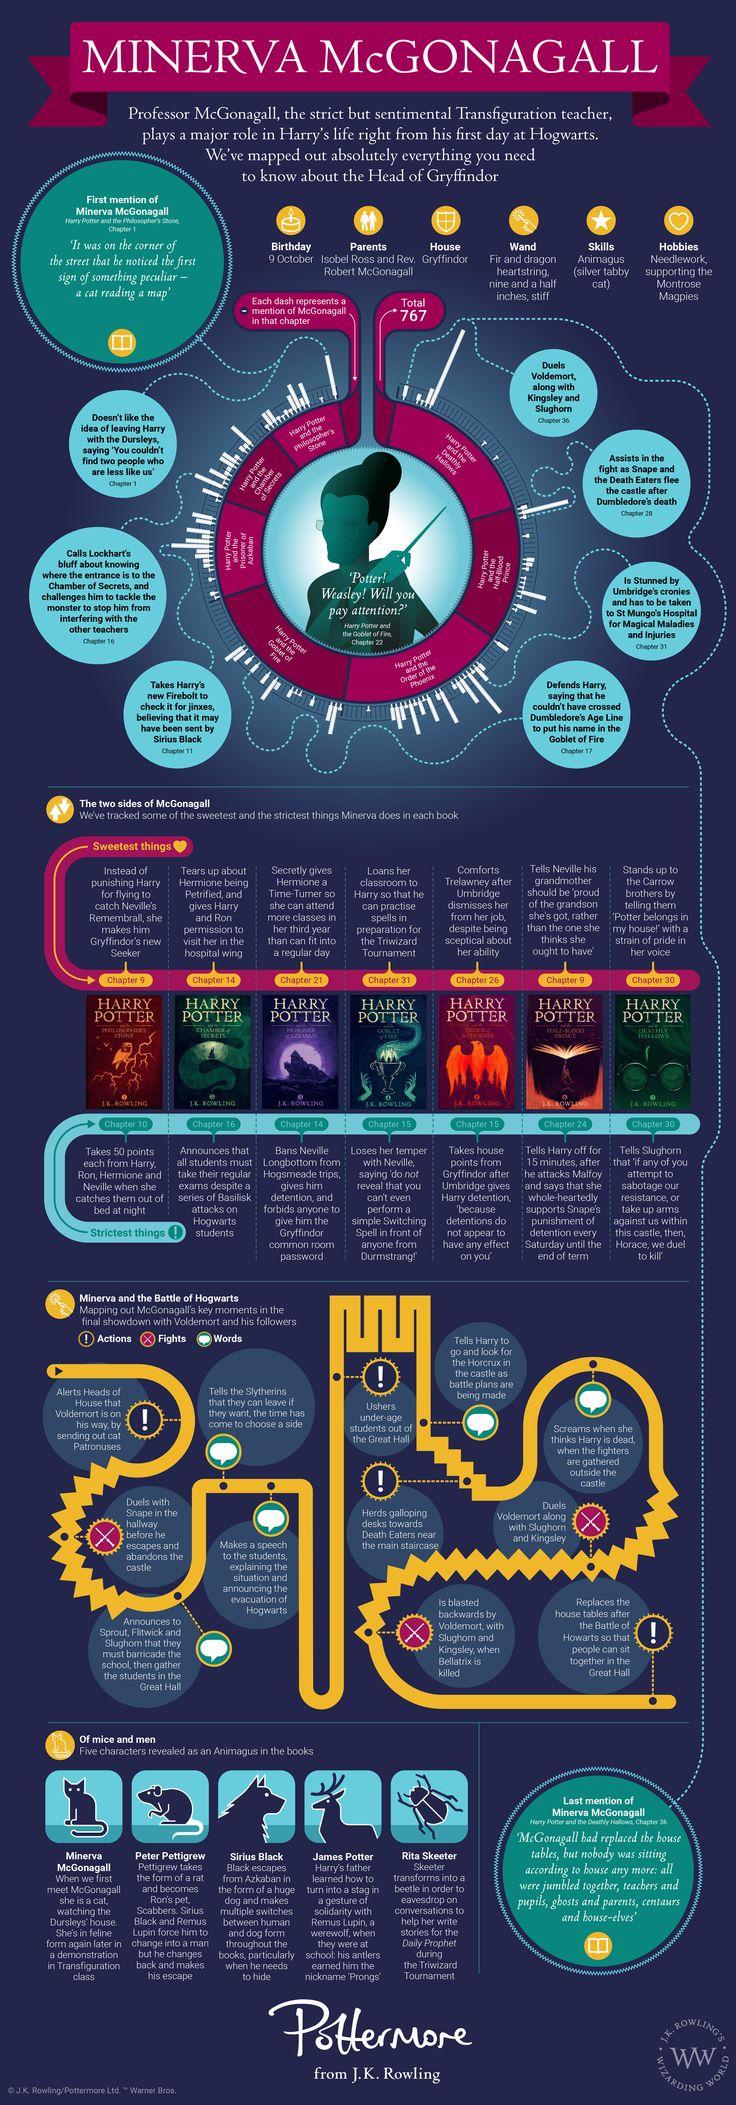 Minerva_McGonagall-Infographic.jpg (3391×9700)